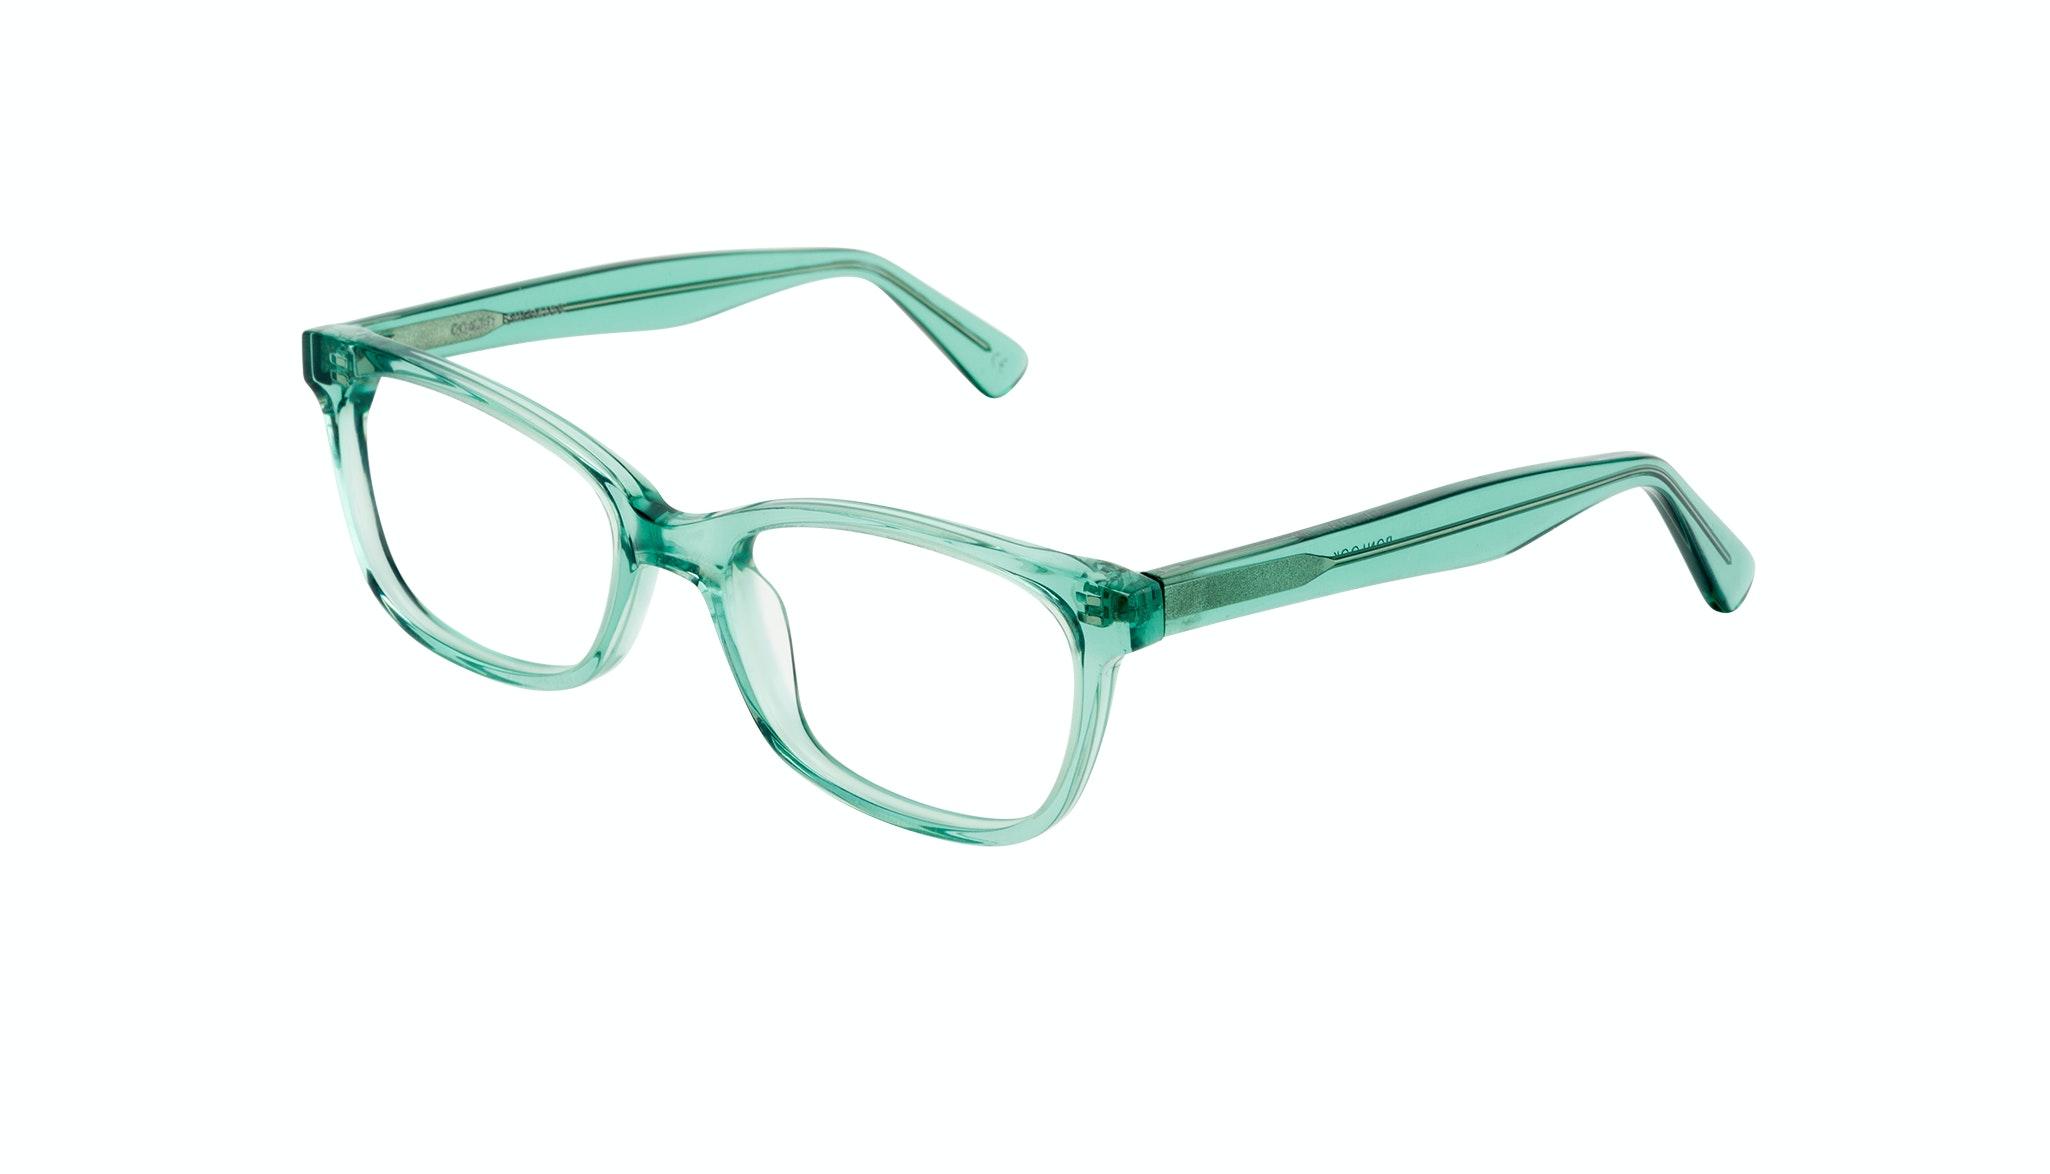 Affordable Fashion Glasses Cat Eye Rectangle Square Eyeglasses Women Comet Emeraude Tilt